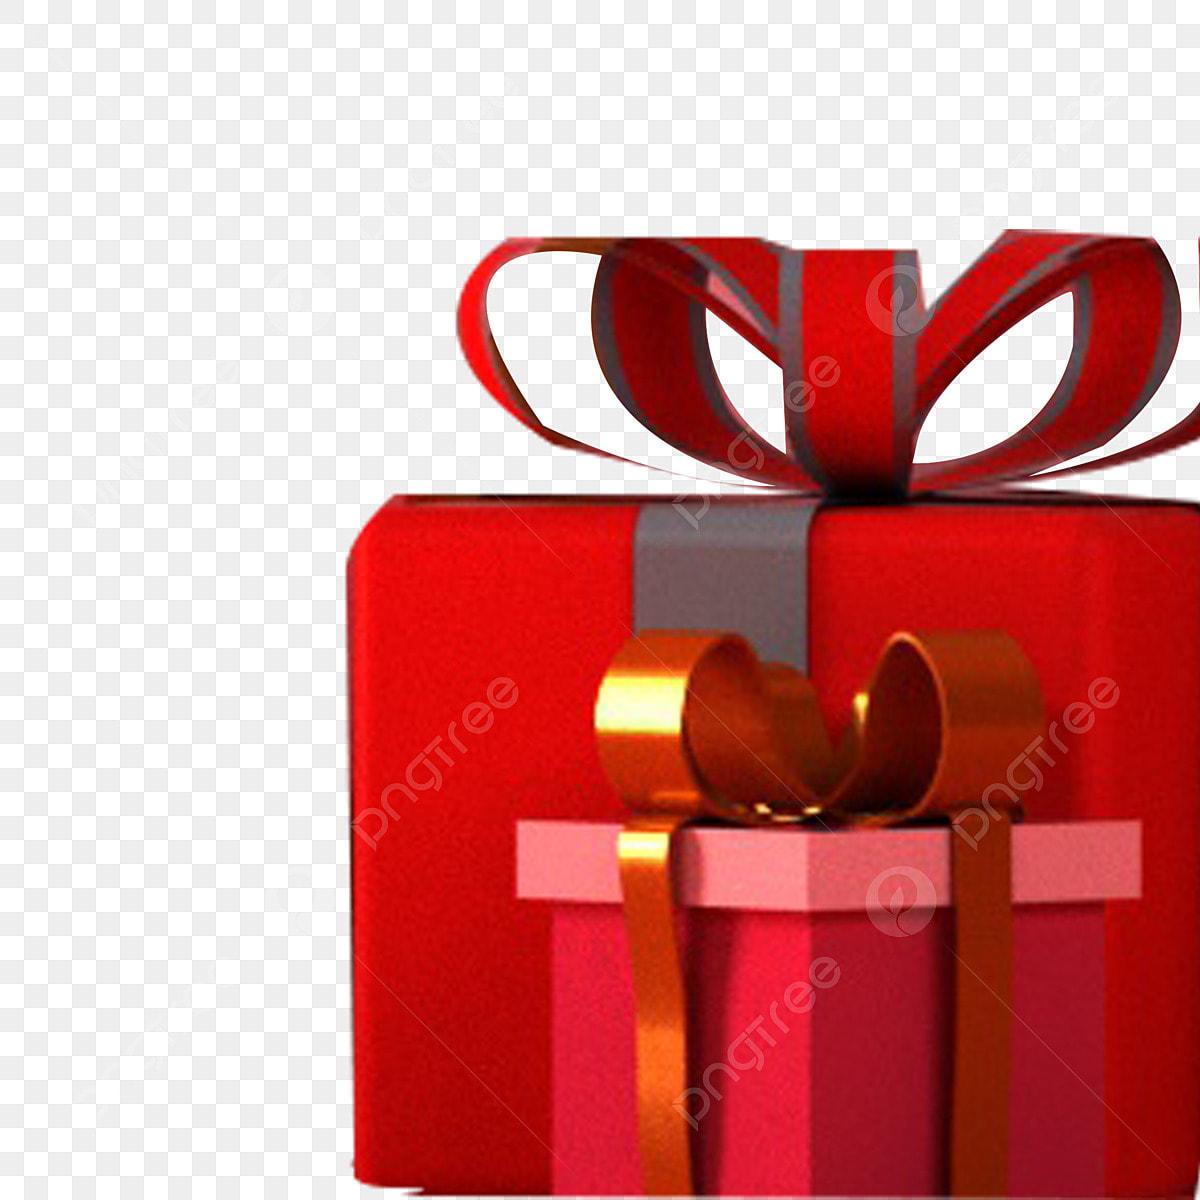 Beg Hadiah Kotak Hadiah Merah Kotak Hadiah Fesyen Kotak